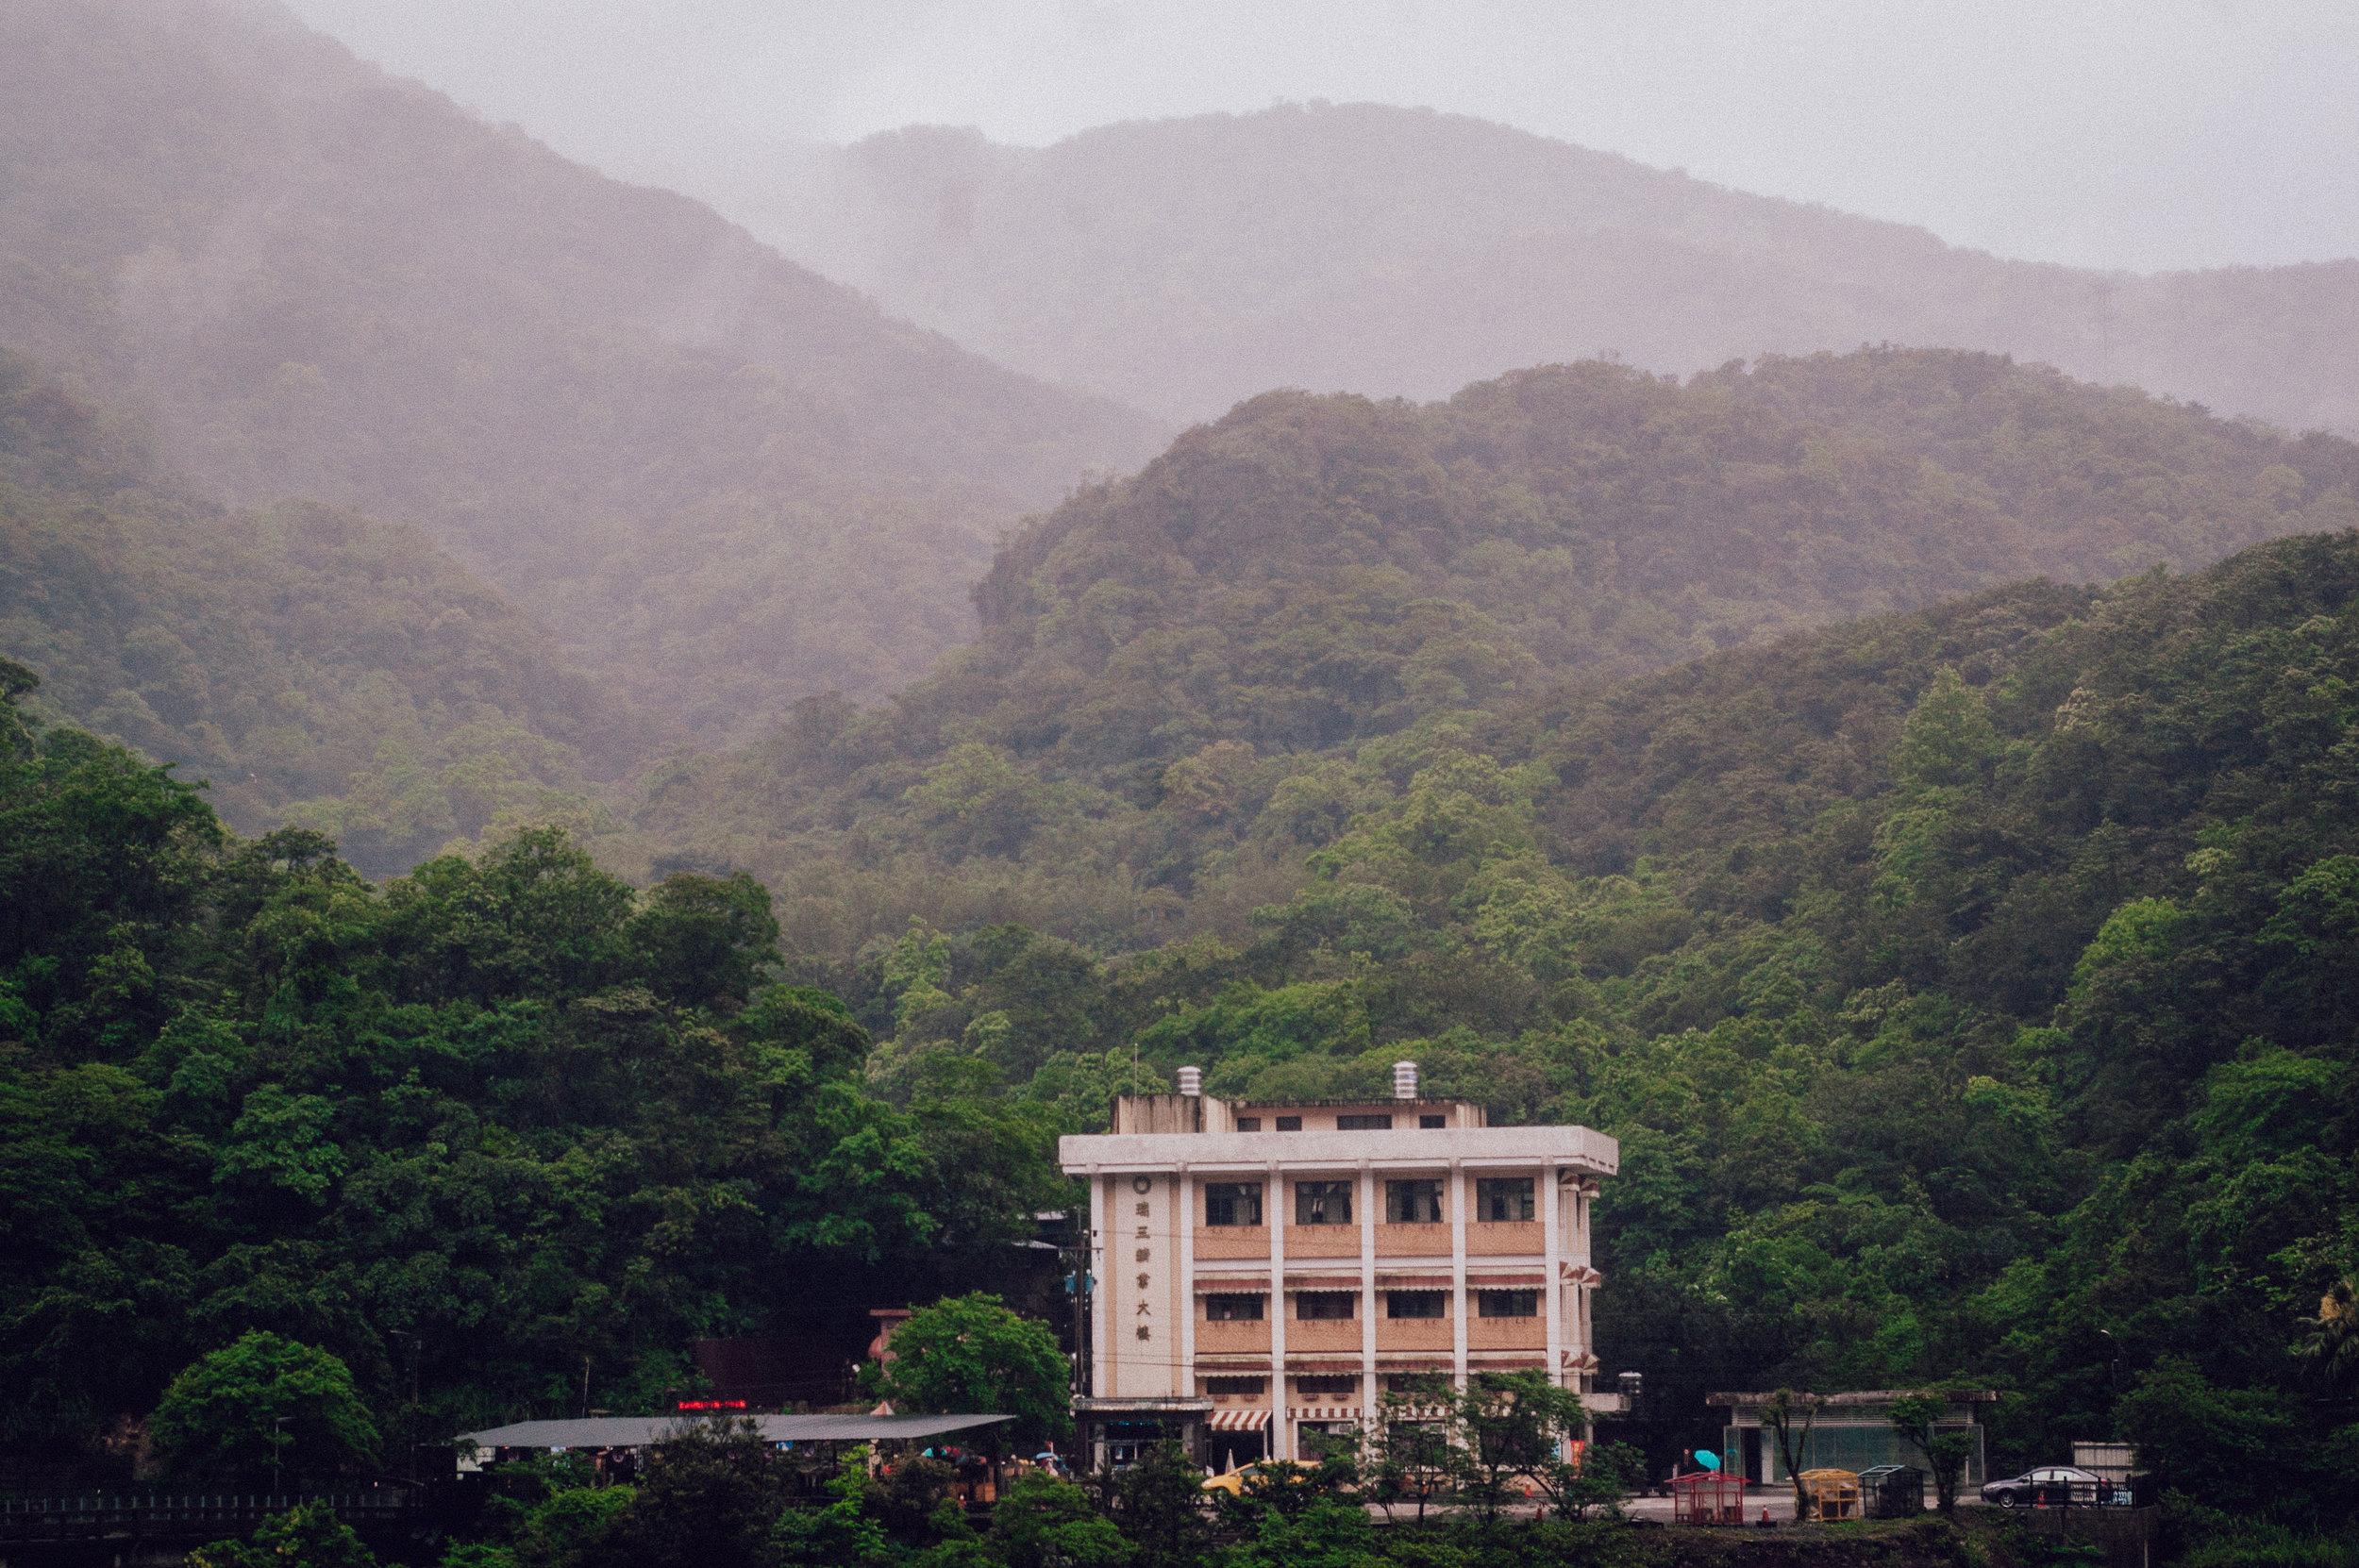 houtong cat village (4 of 13).jpg